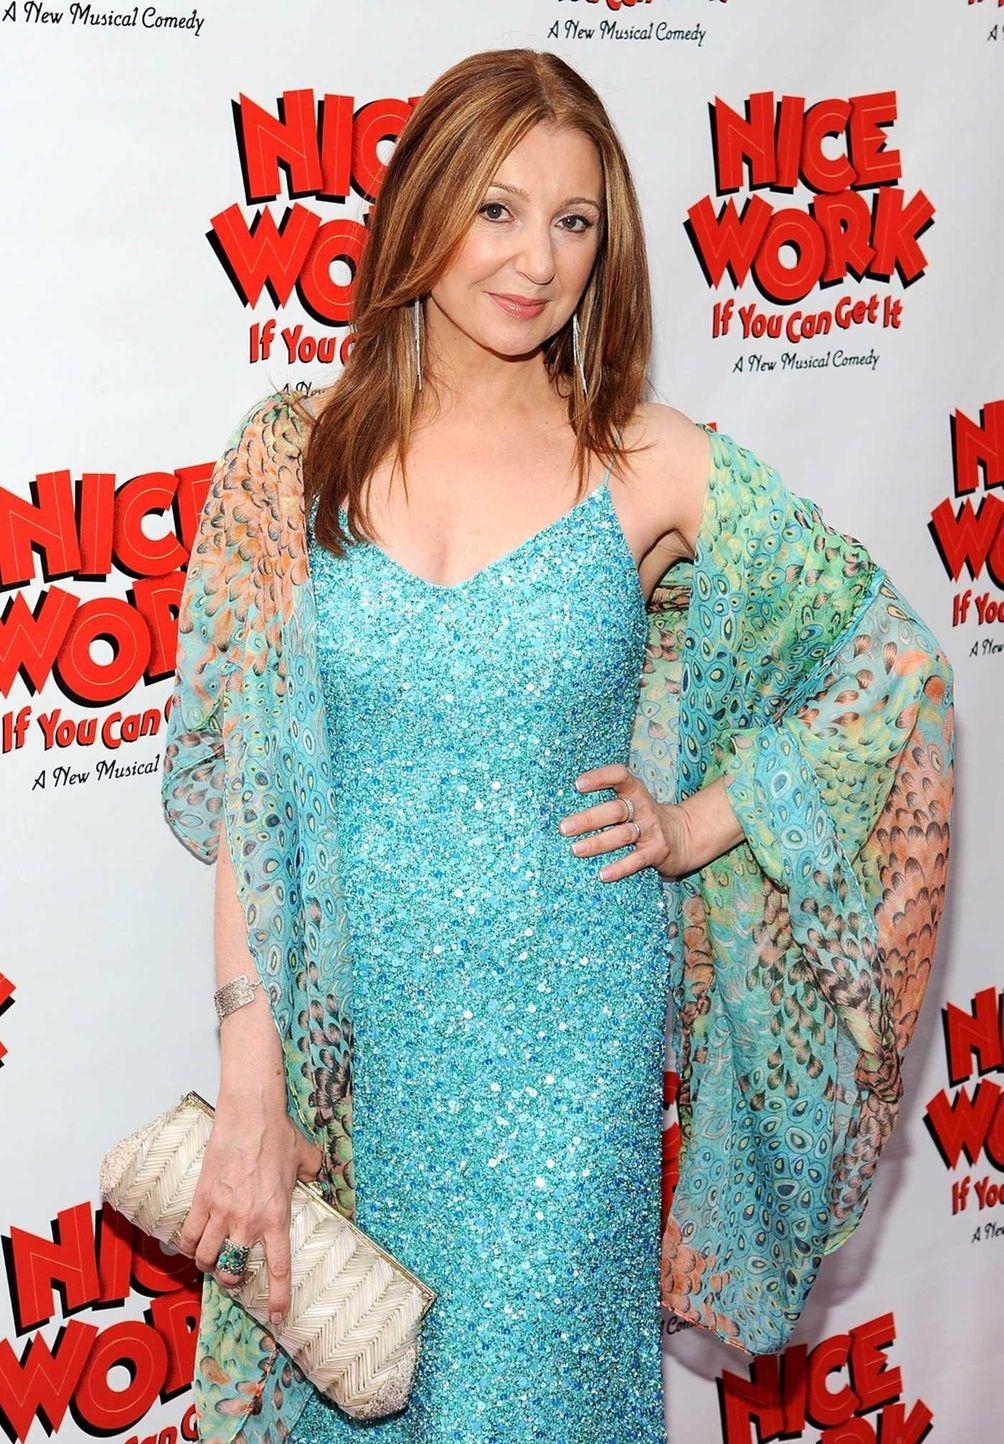 Donna Murphy, two-time Tony Award winner, grew up